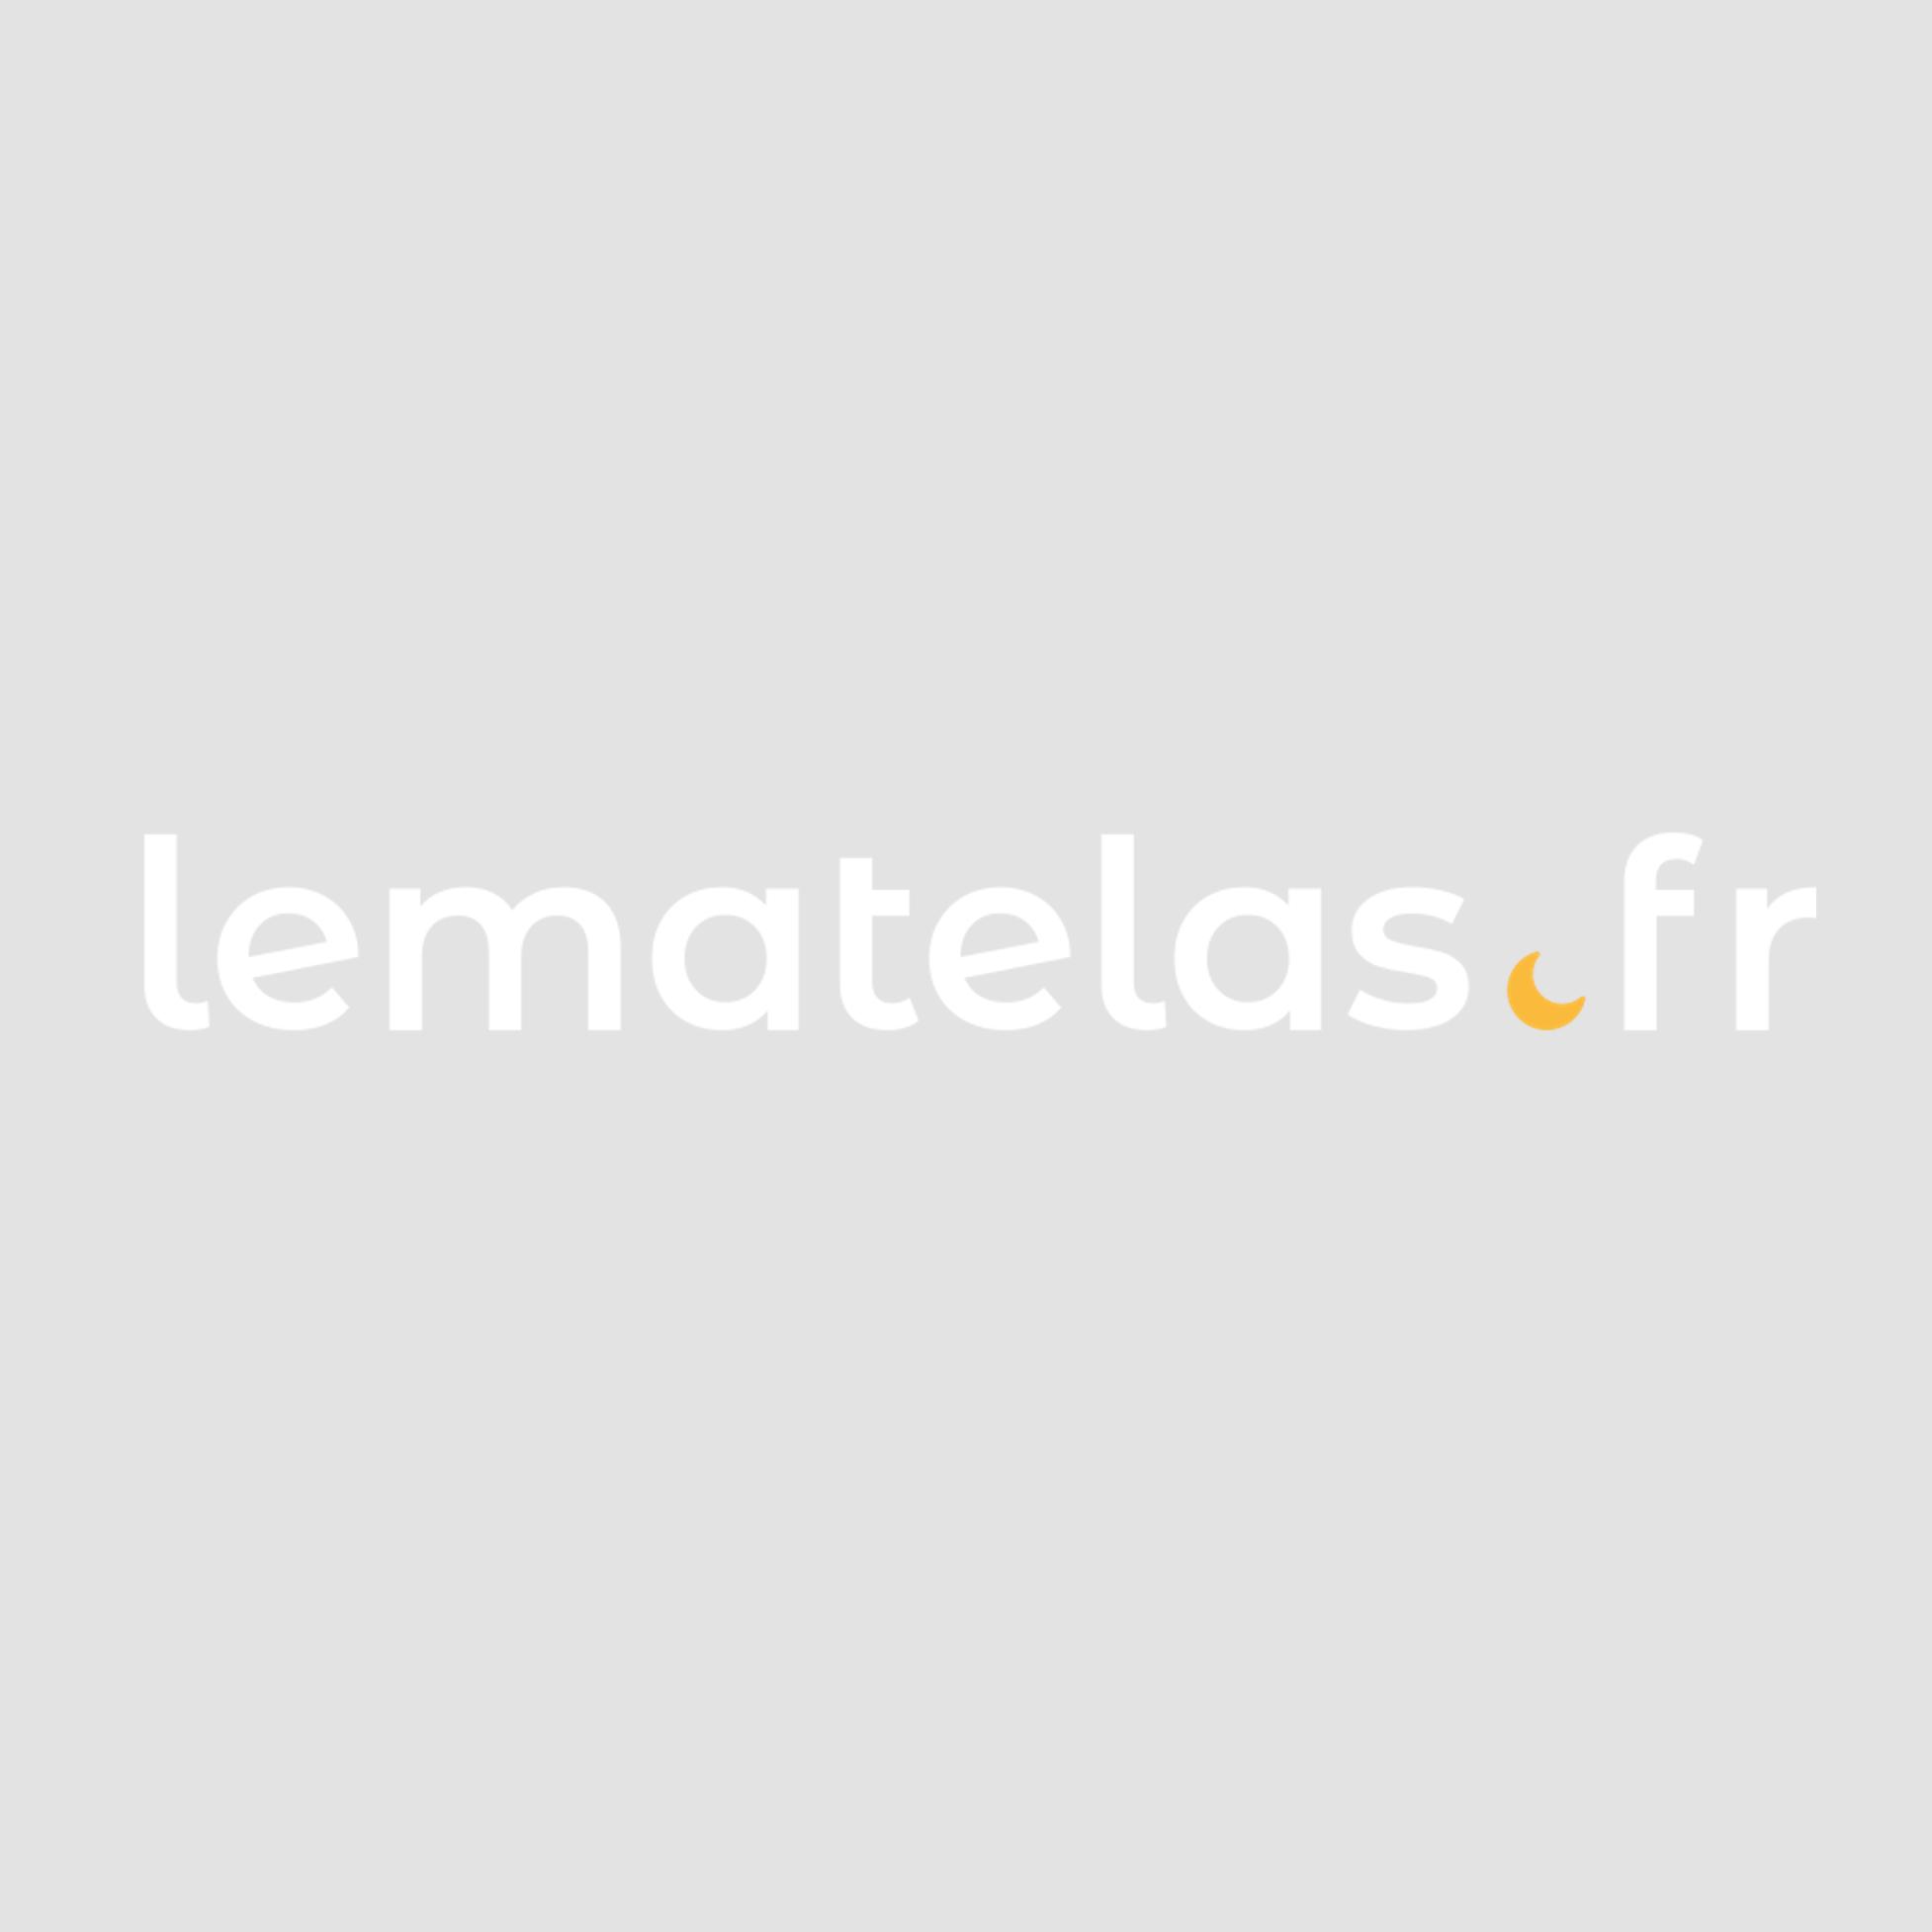 Someo Lot de 2 oreillers luxe enveloppe percale anti-acariens SOMEO 60x60